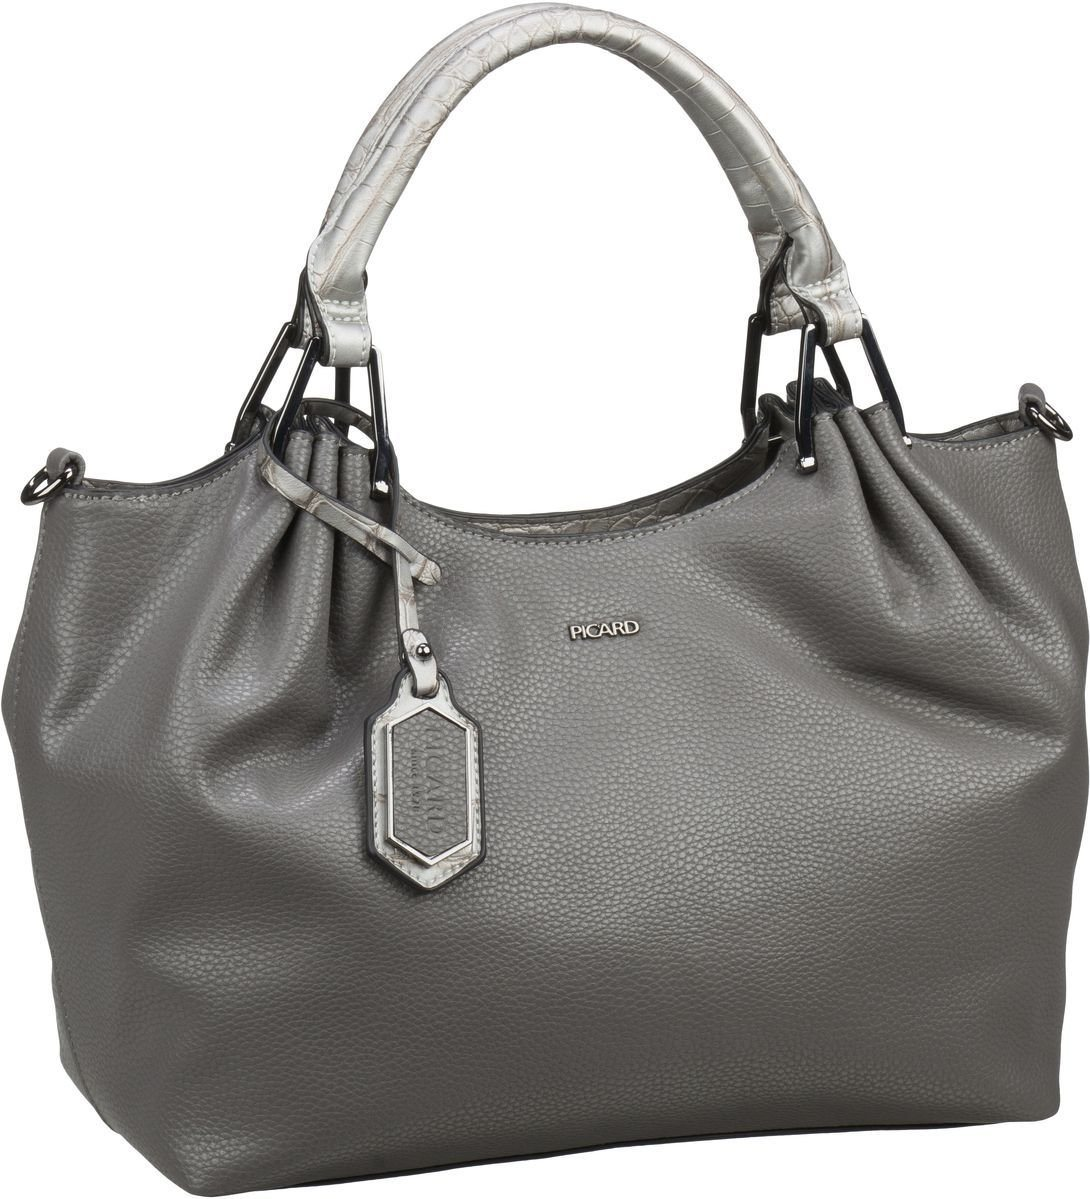 72326dd8b3dca Picard Handtasche »Allora 2468«